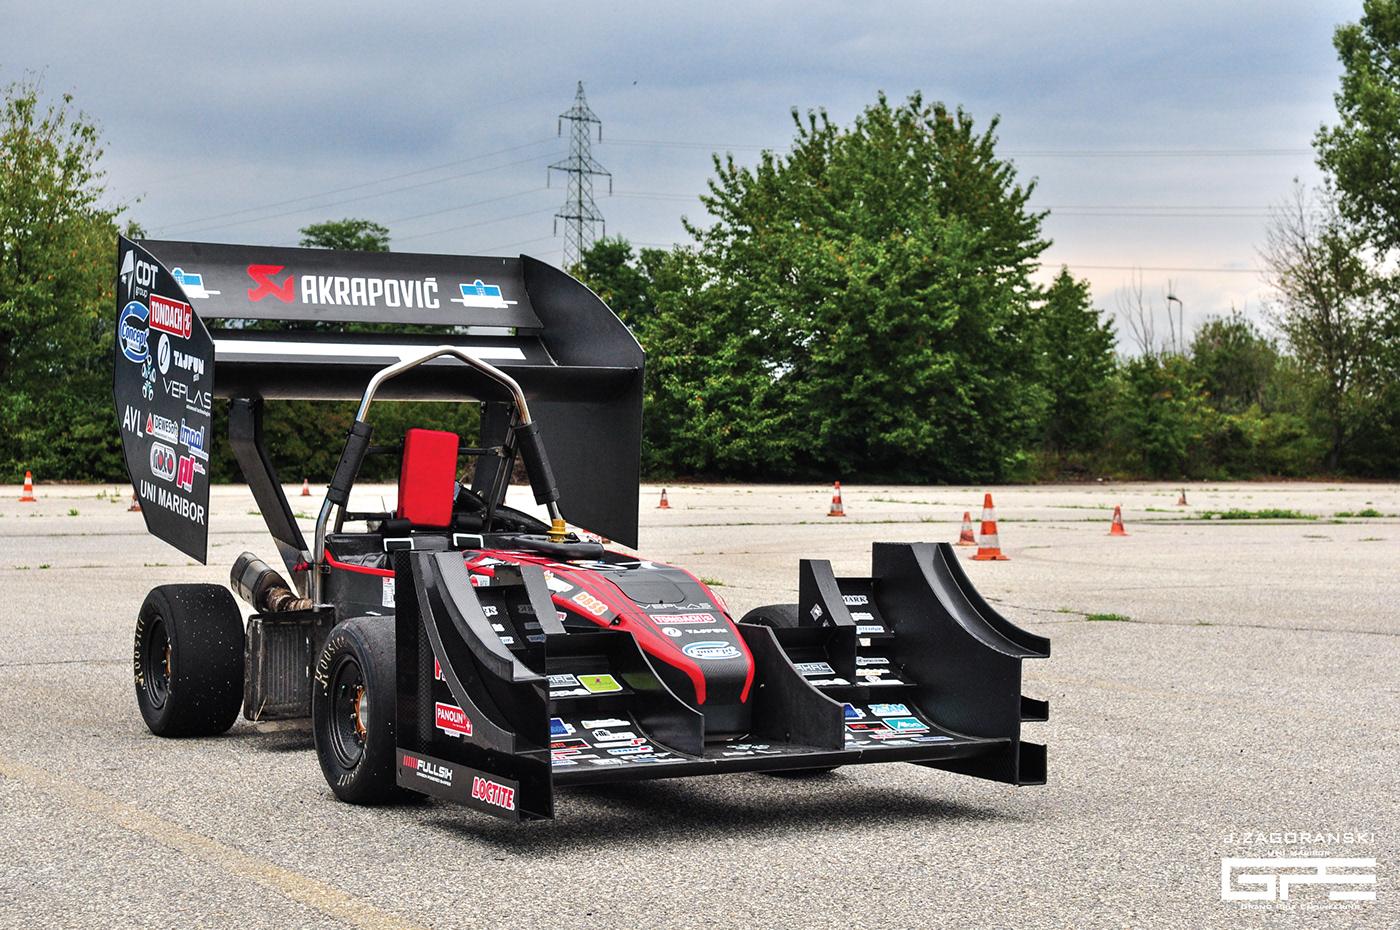 uni maribor formula student gpe14 f1 racecar Racing